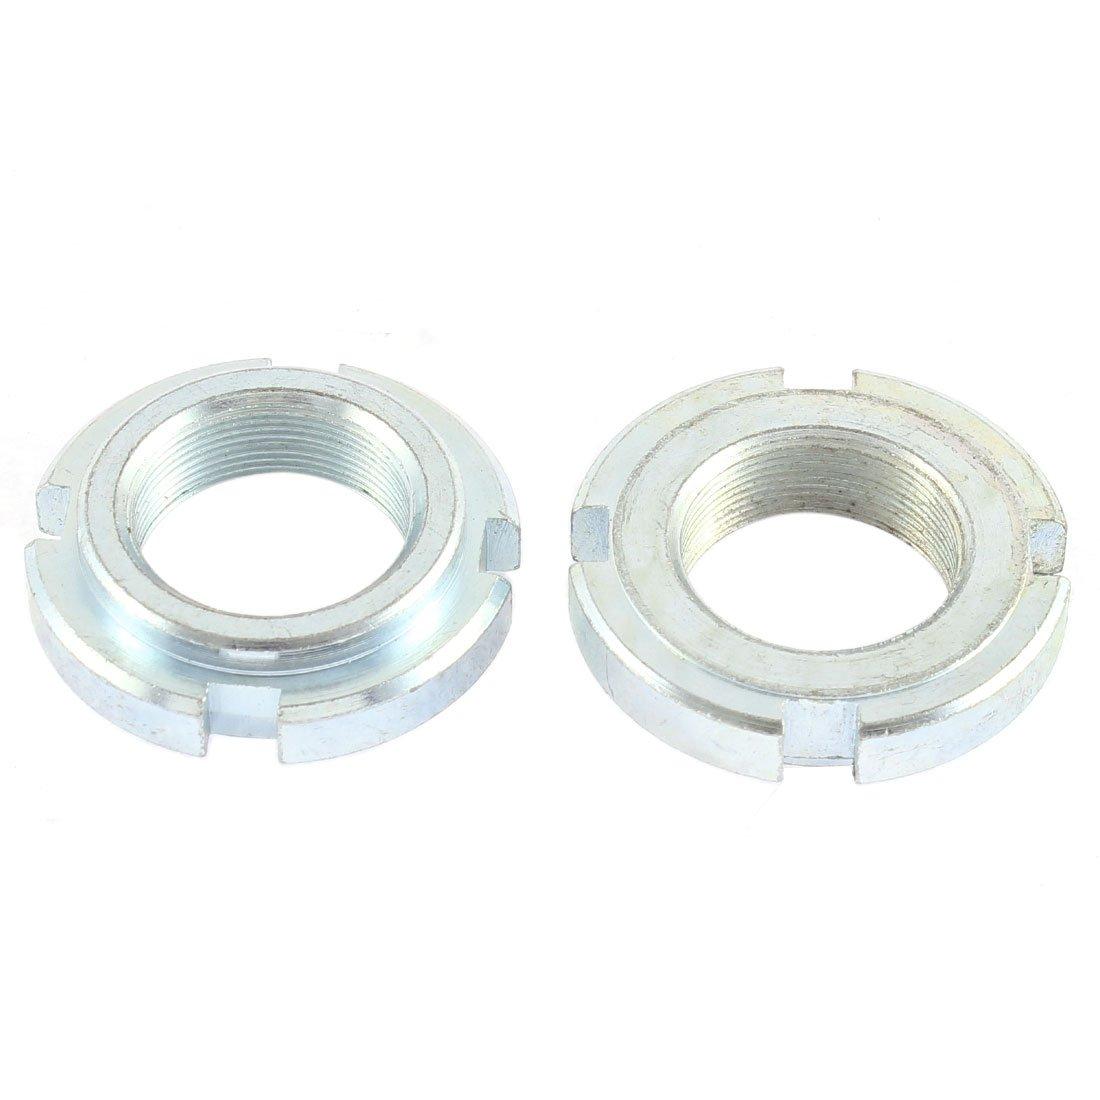 2xSilver Tone 24mm Thread Steering Stem Lock Nut